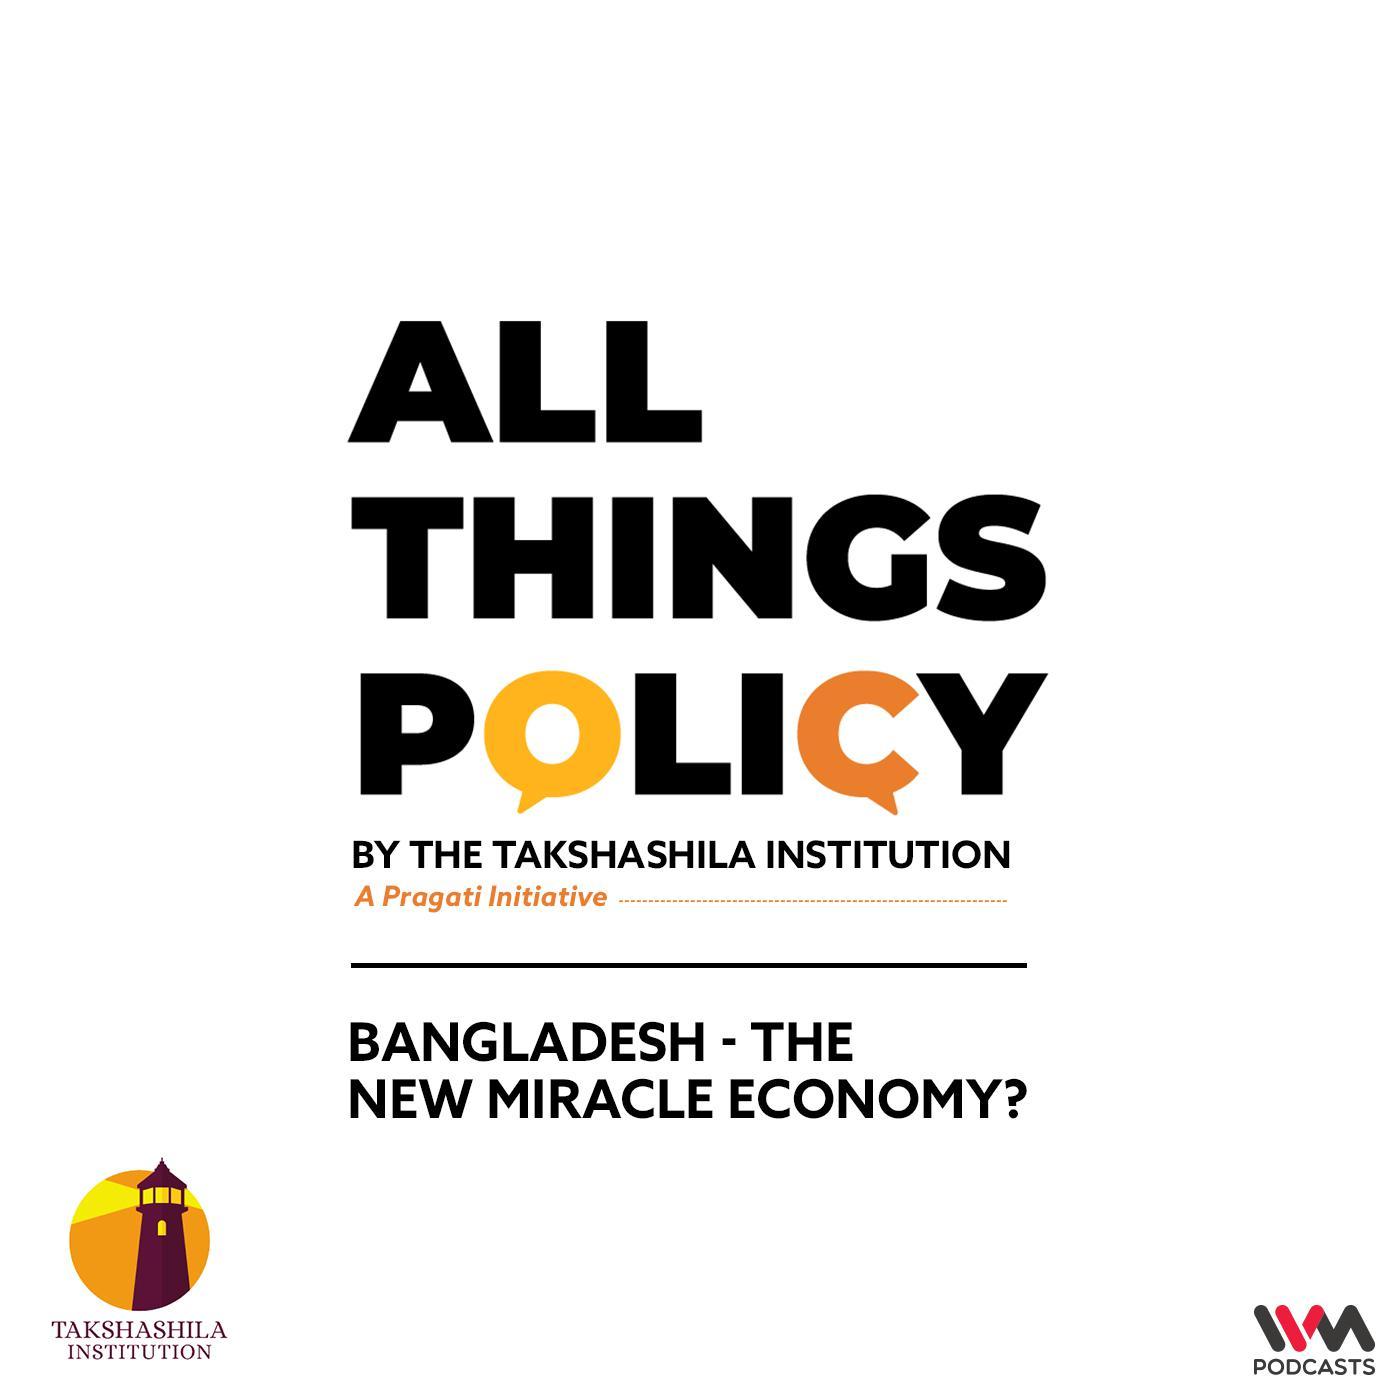 Ep. 623: Bangladesh - The New Miracle Economy?